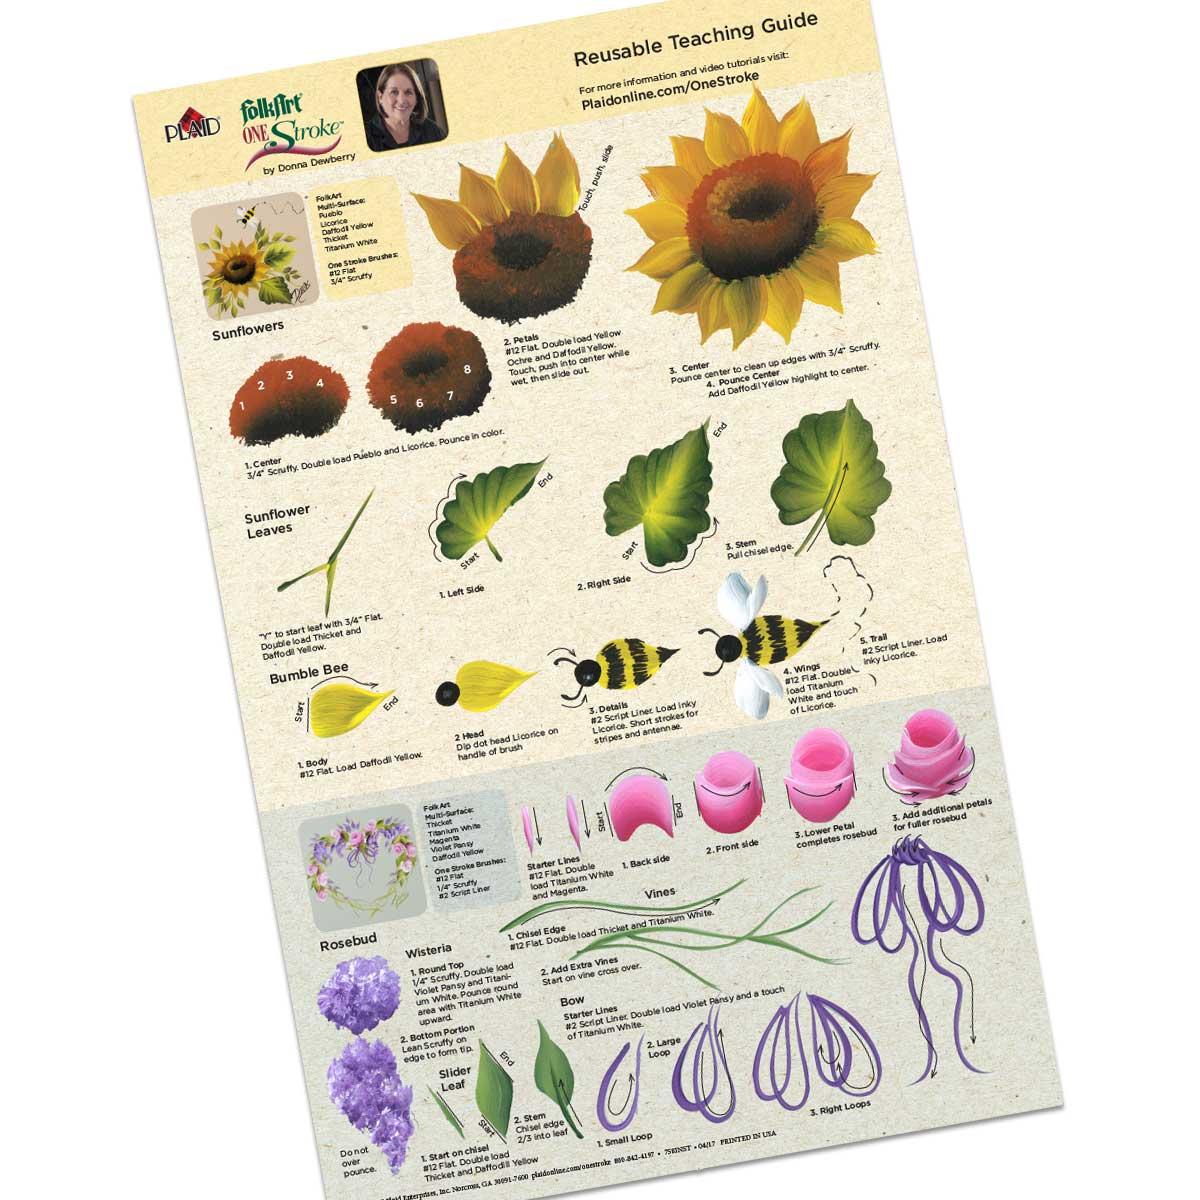 FolkArt ® One Stroke™ Beginner Kit by Donna Dewberry - AD758